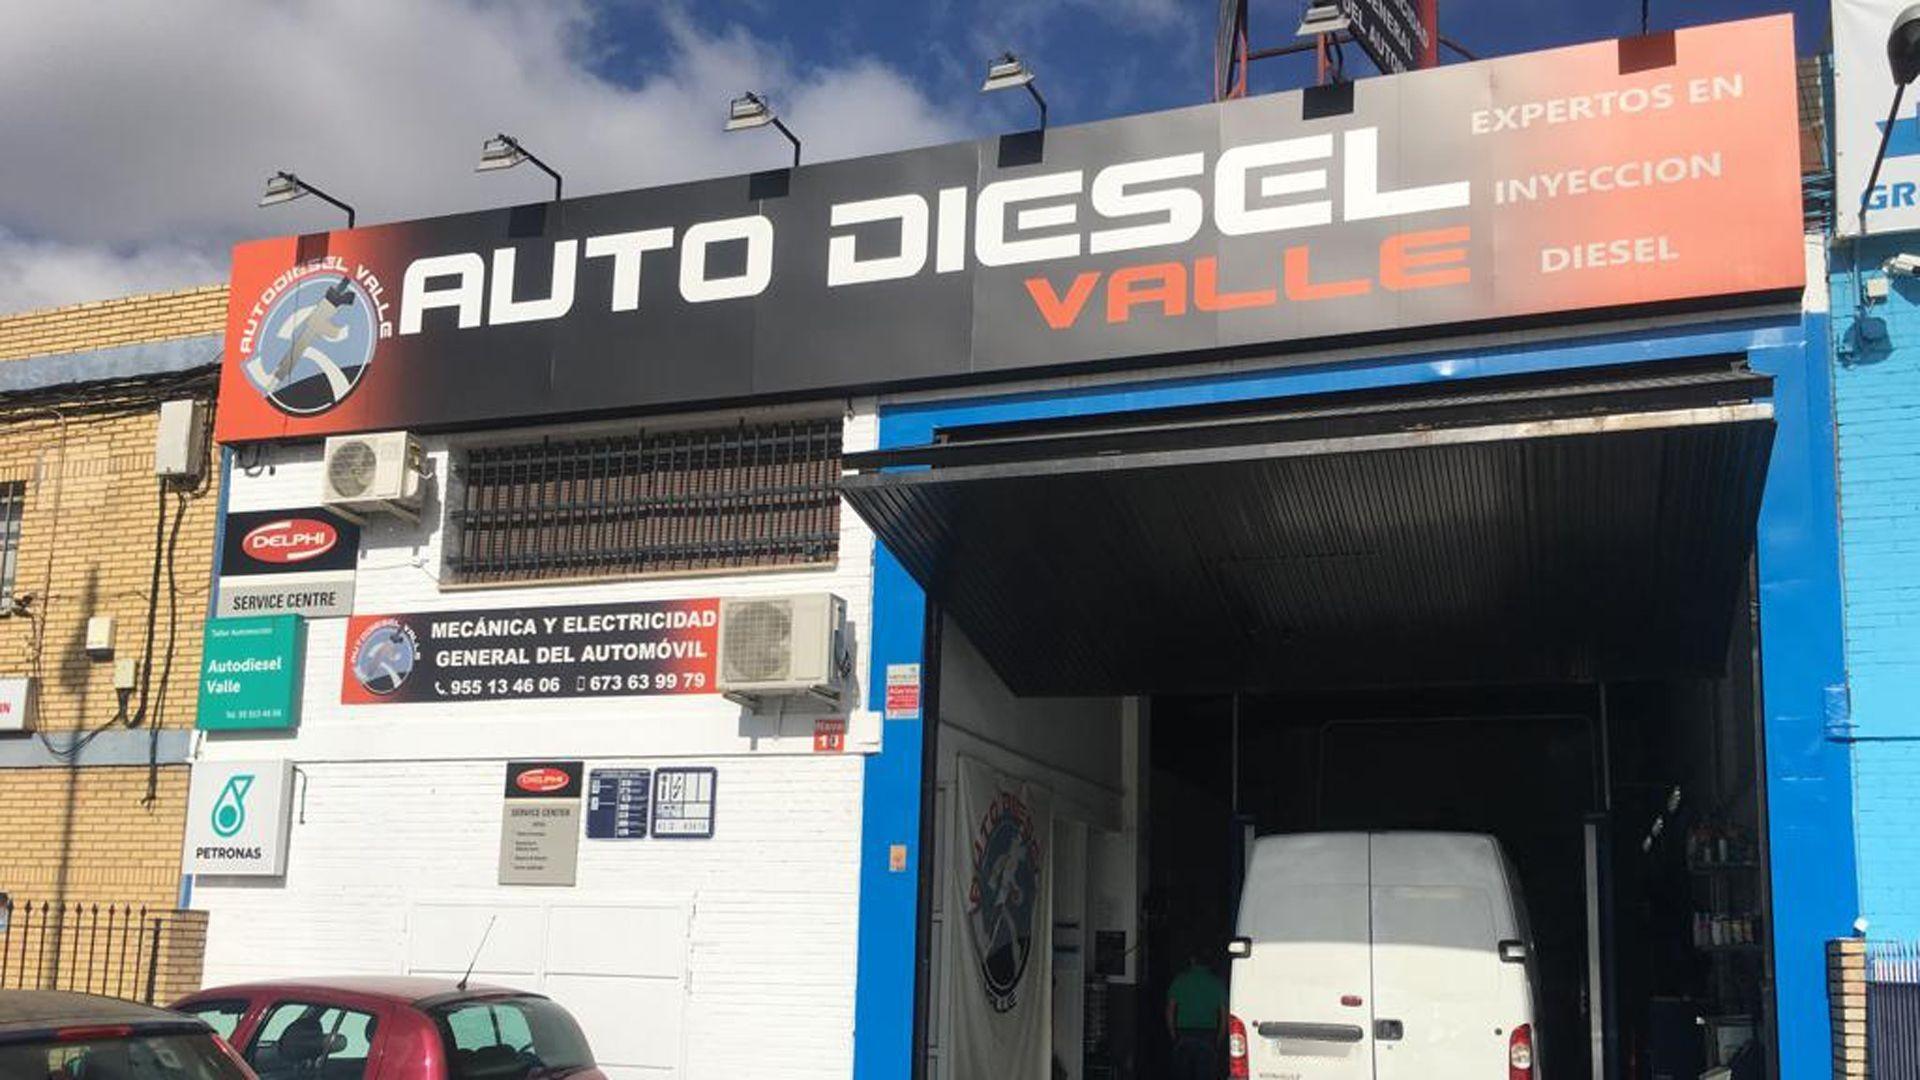 Taller especializado en motores diésel en Sevilla